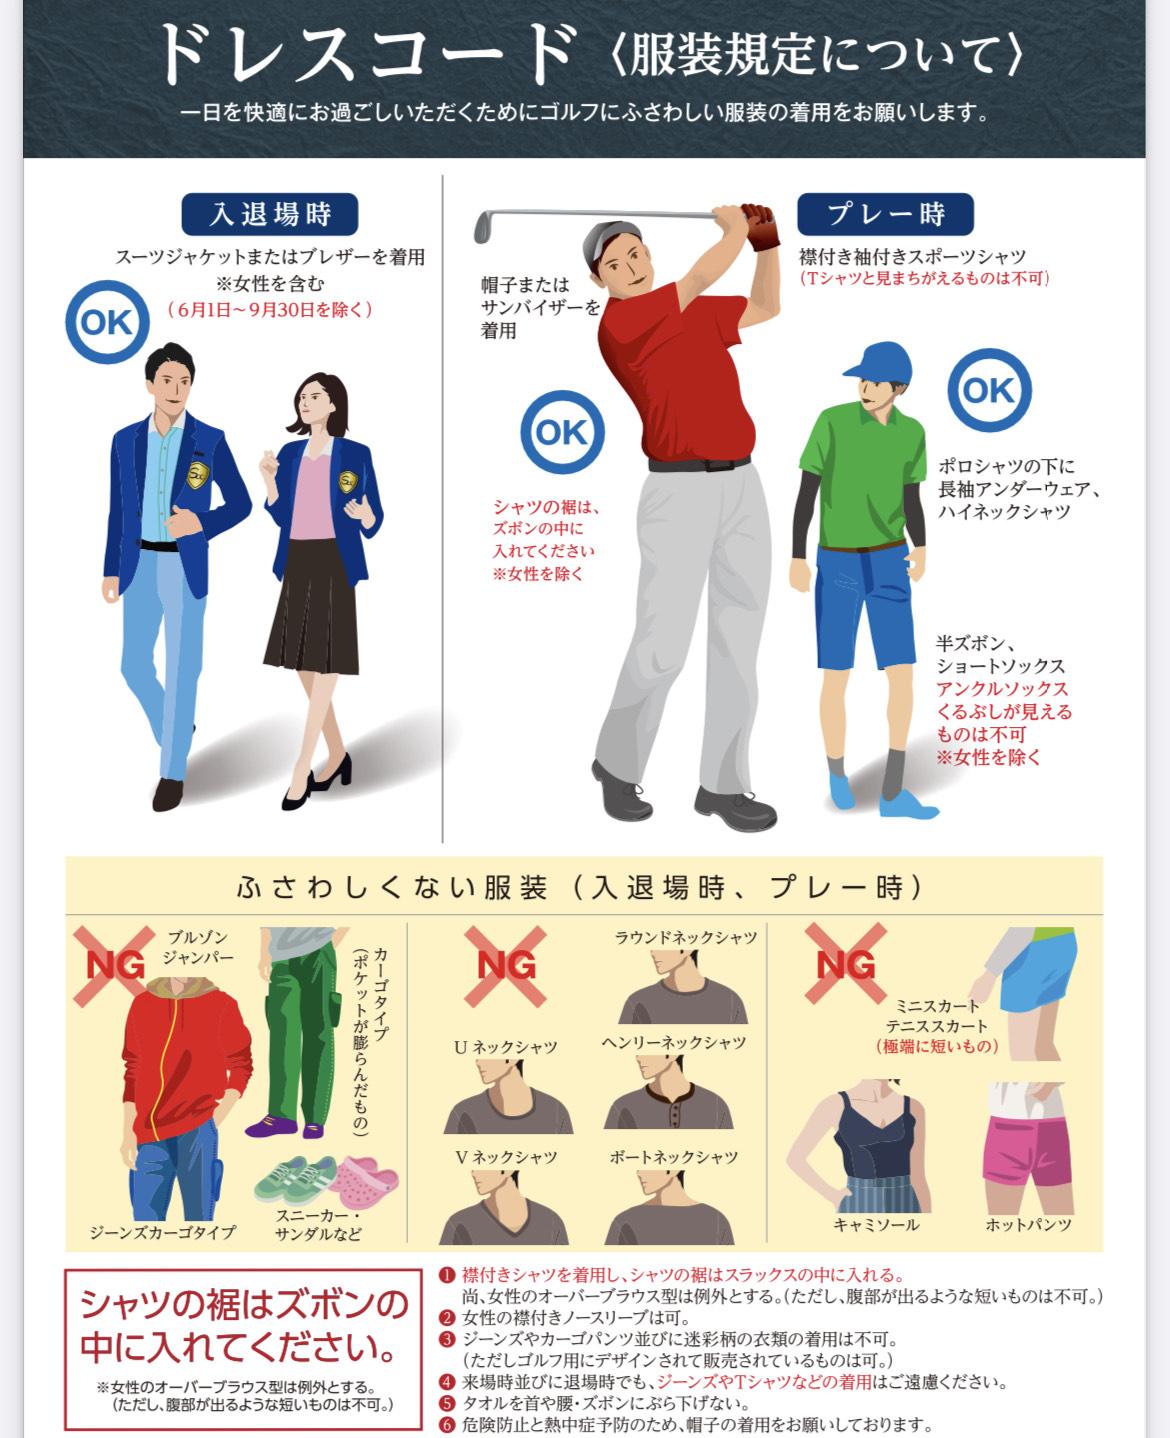 PGMゴルフグループのドレスコード(服装規定)について